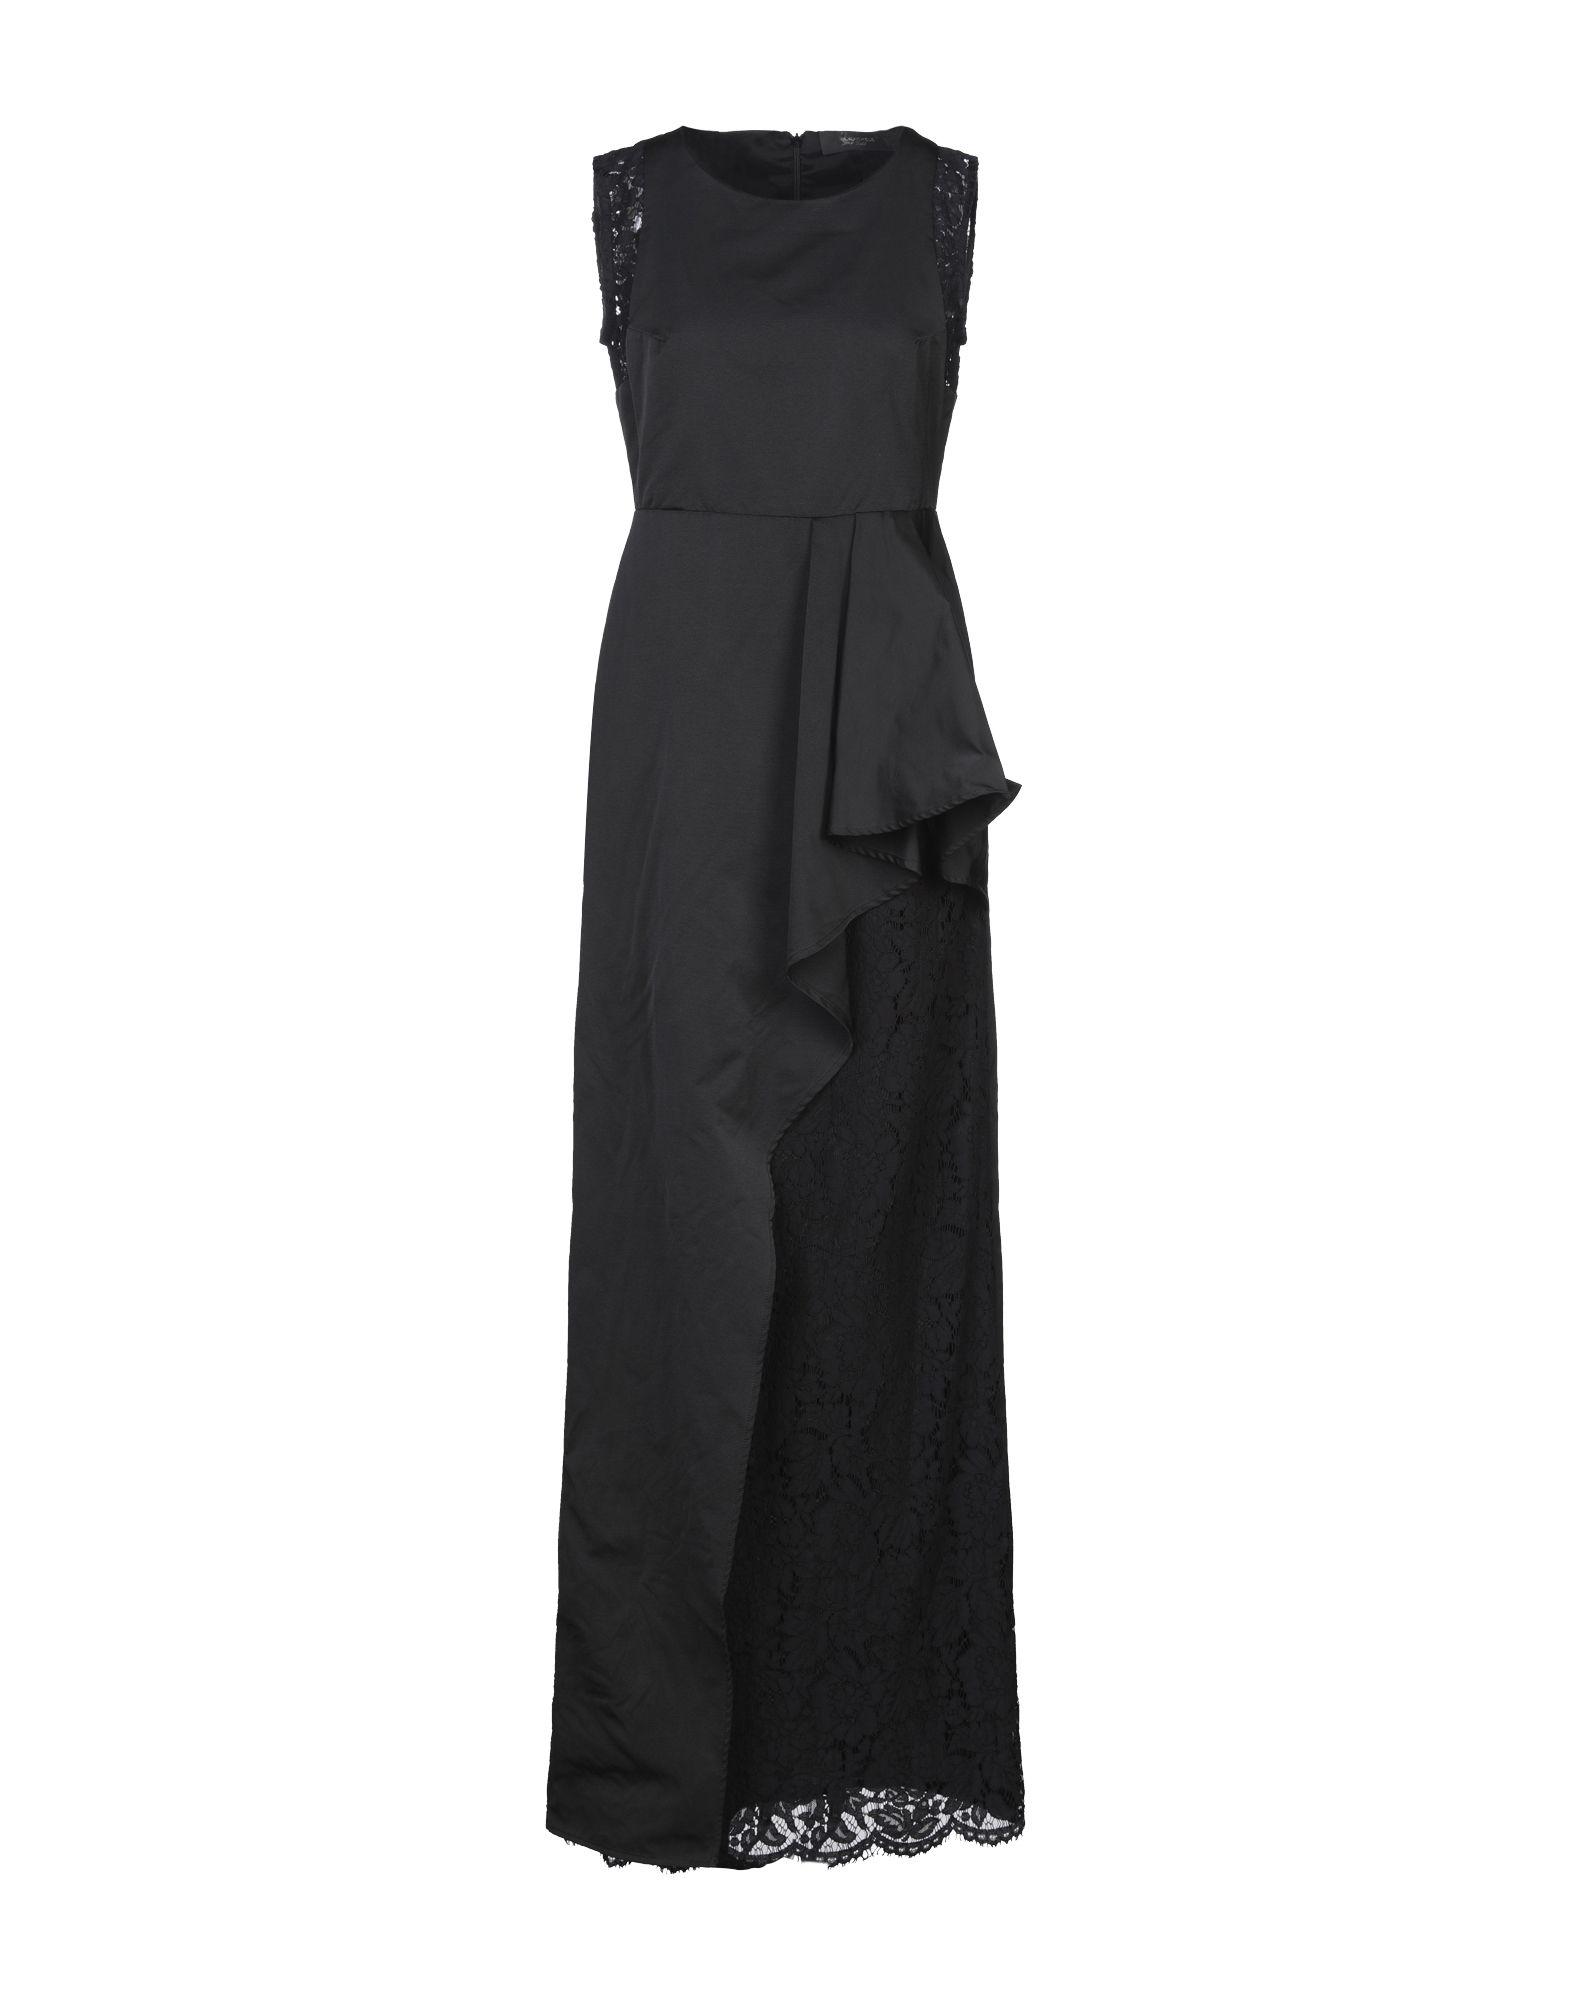 ANNA RACHELE BLACK LABEL Длинное платье anna rachele black label топ без рукавов